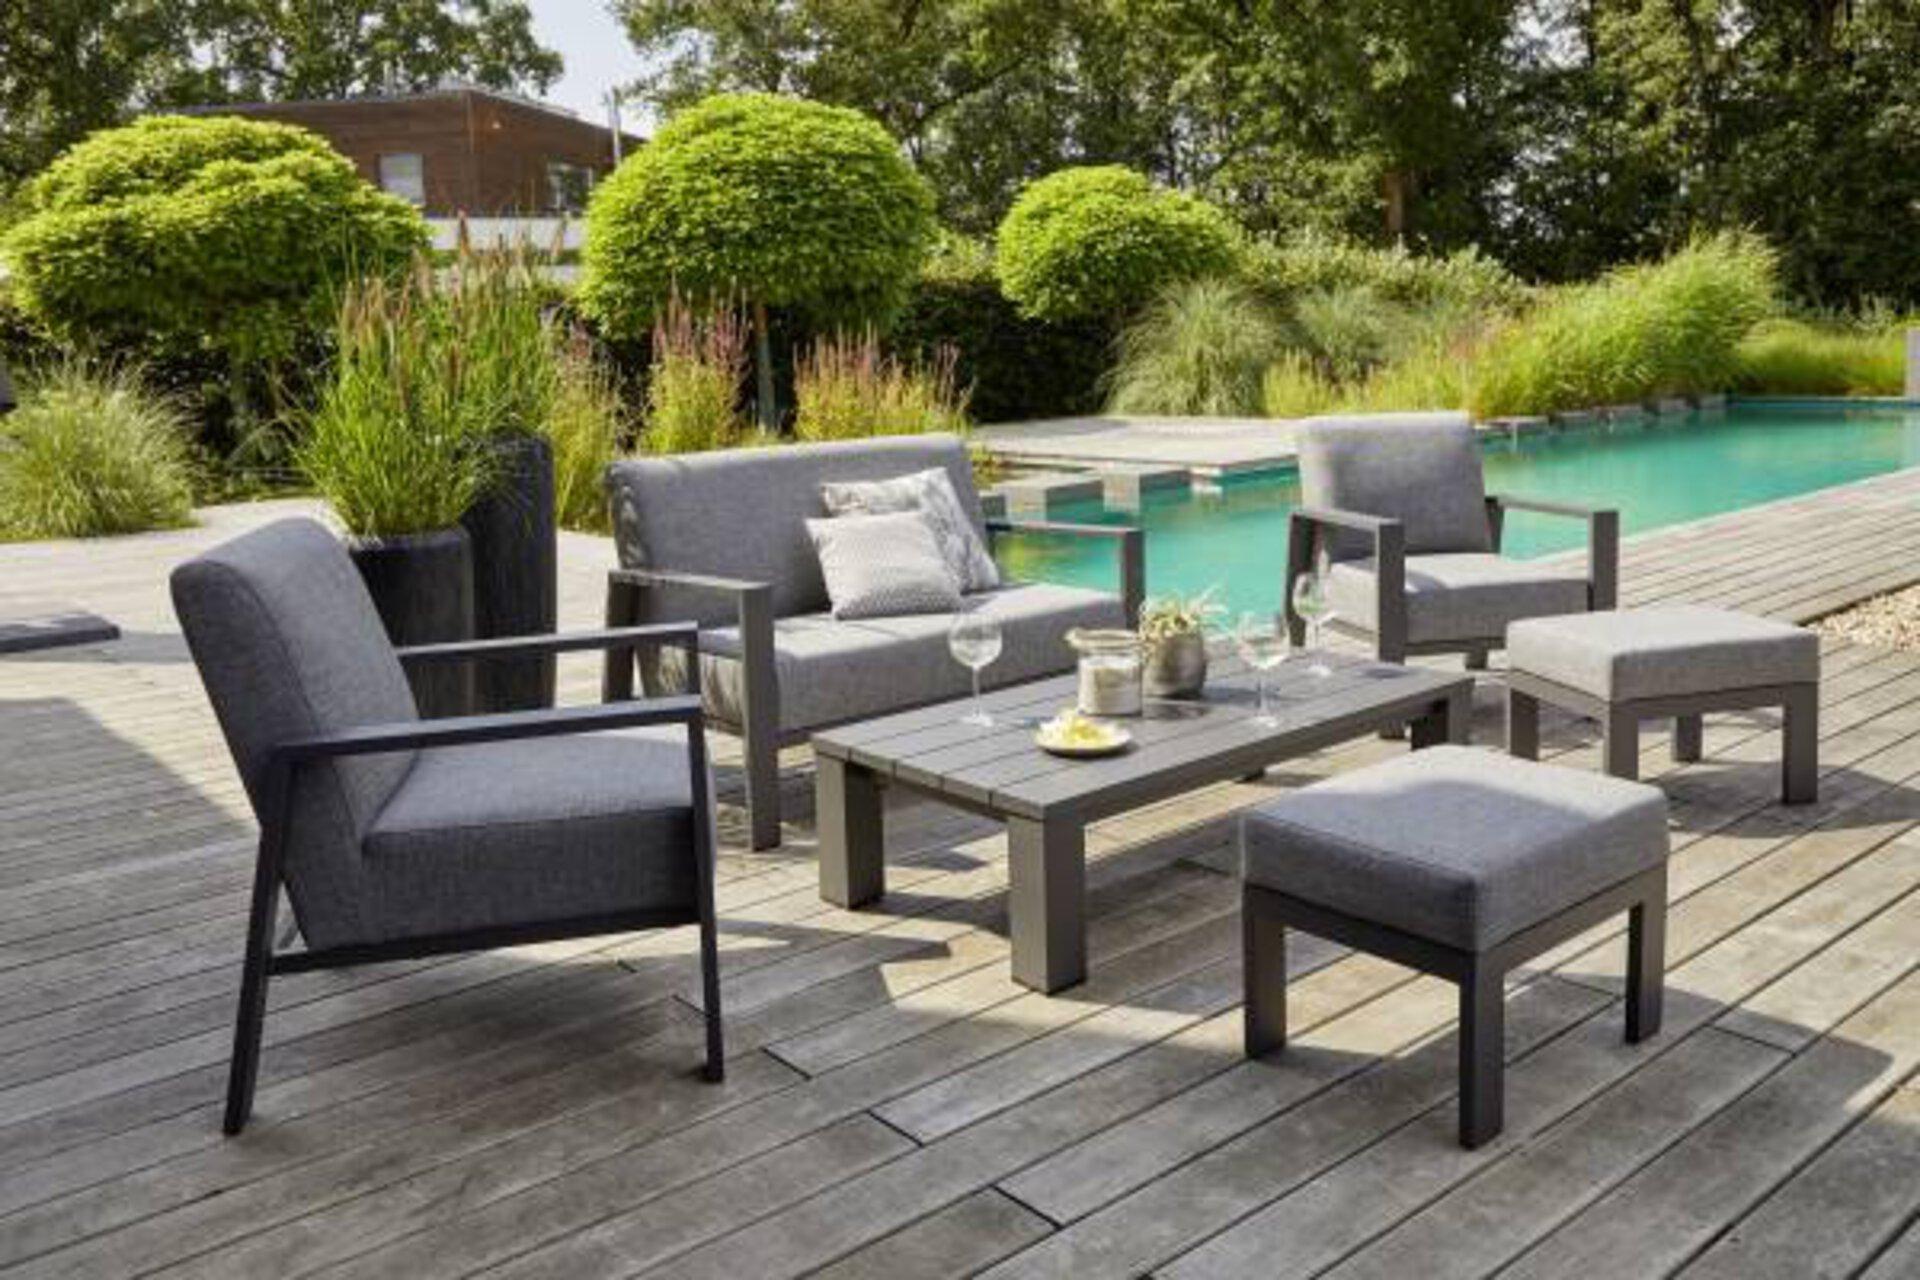 Loungesessel DJERBA Outdoor Textil grau 92 x 79 x 76 cm